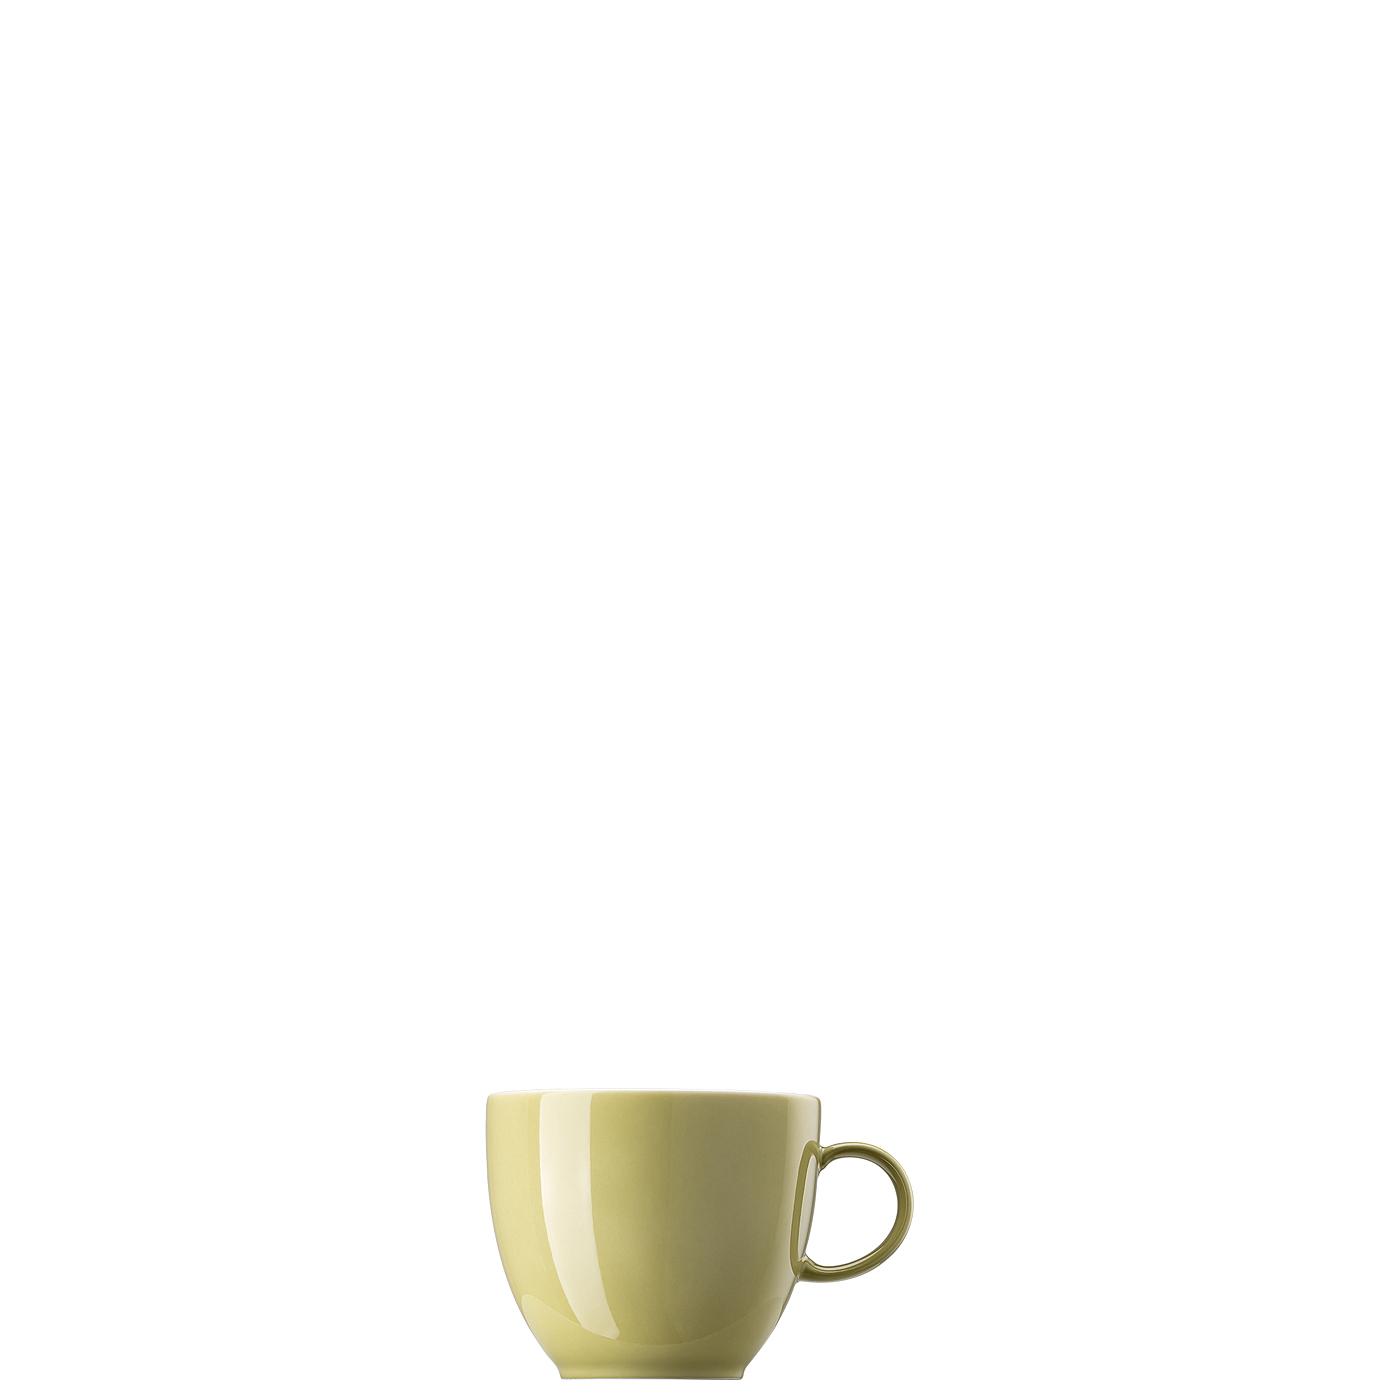 Kaffee-Obertasse Sunny Day Avocado Green Thomas Porzellan